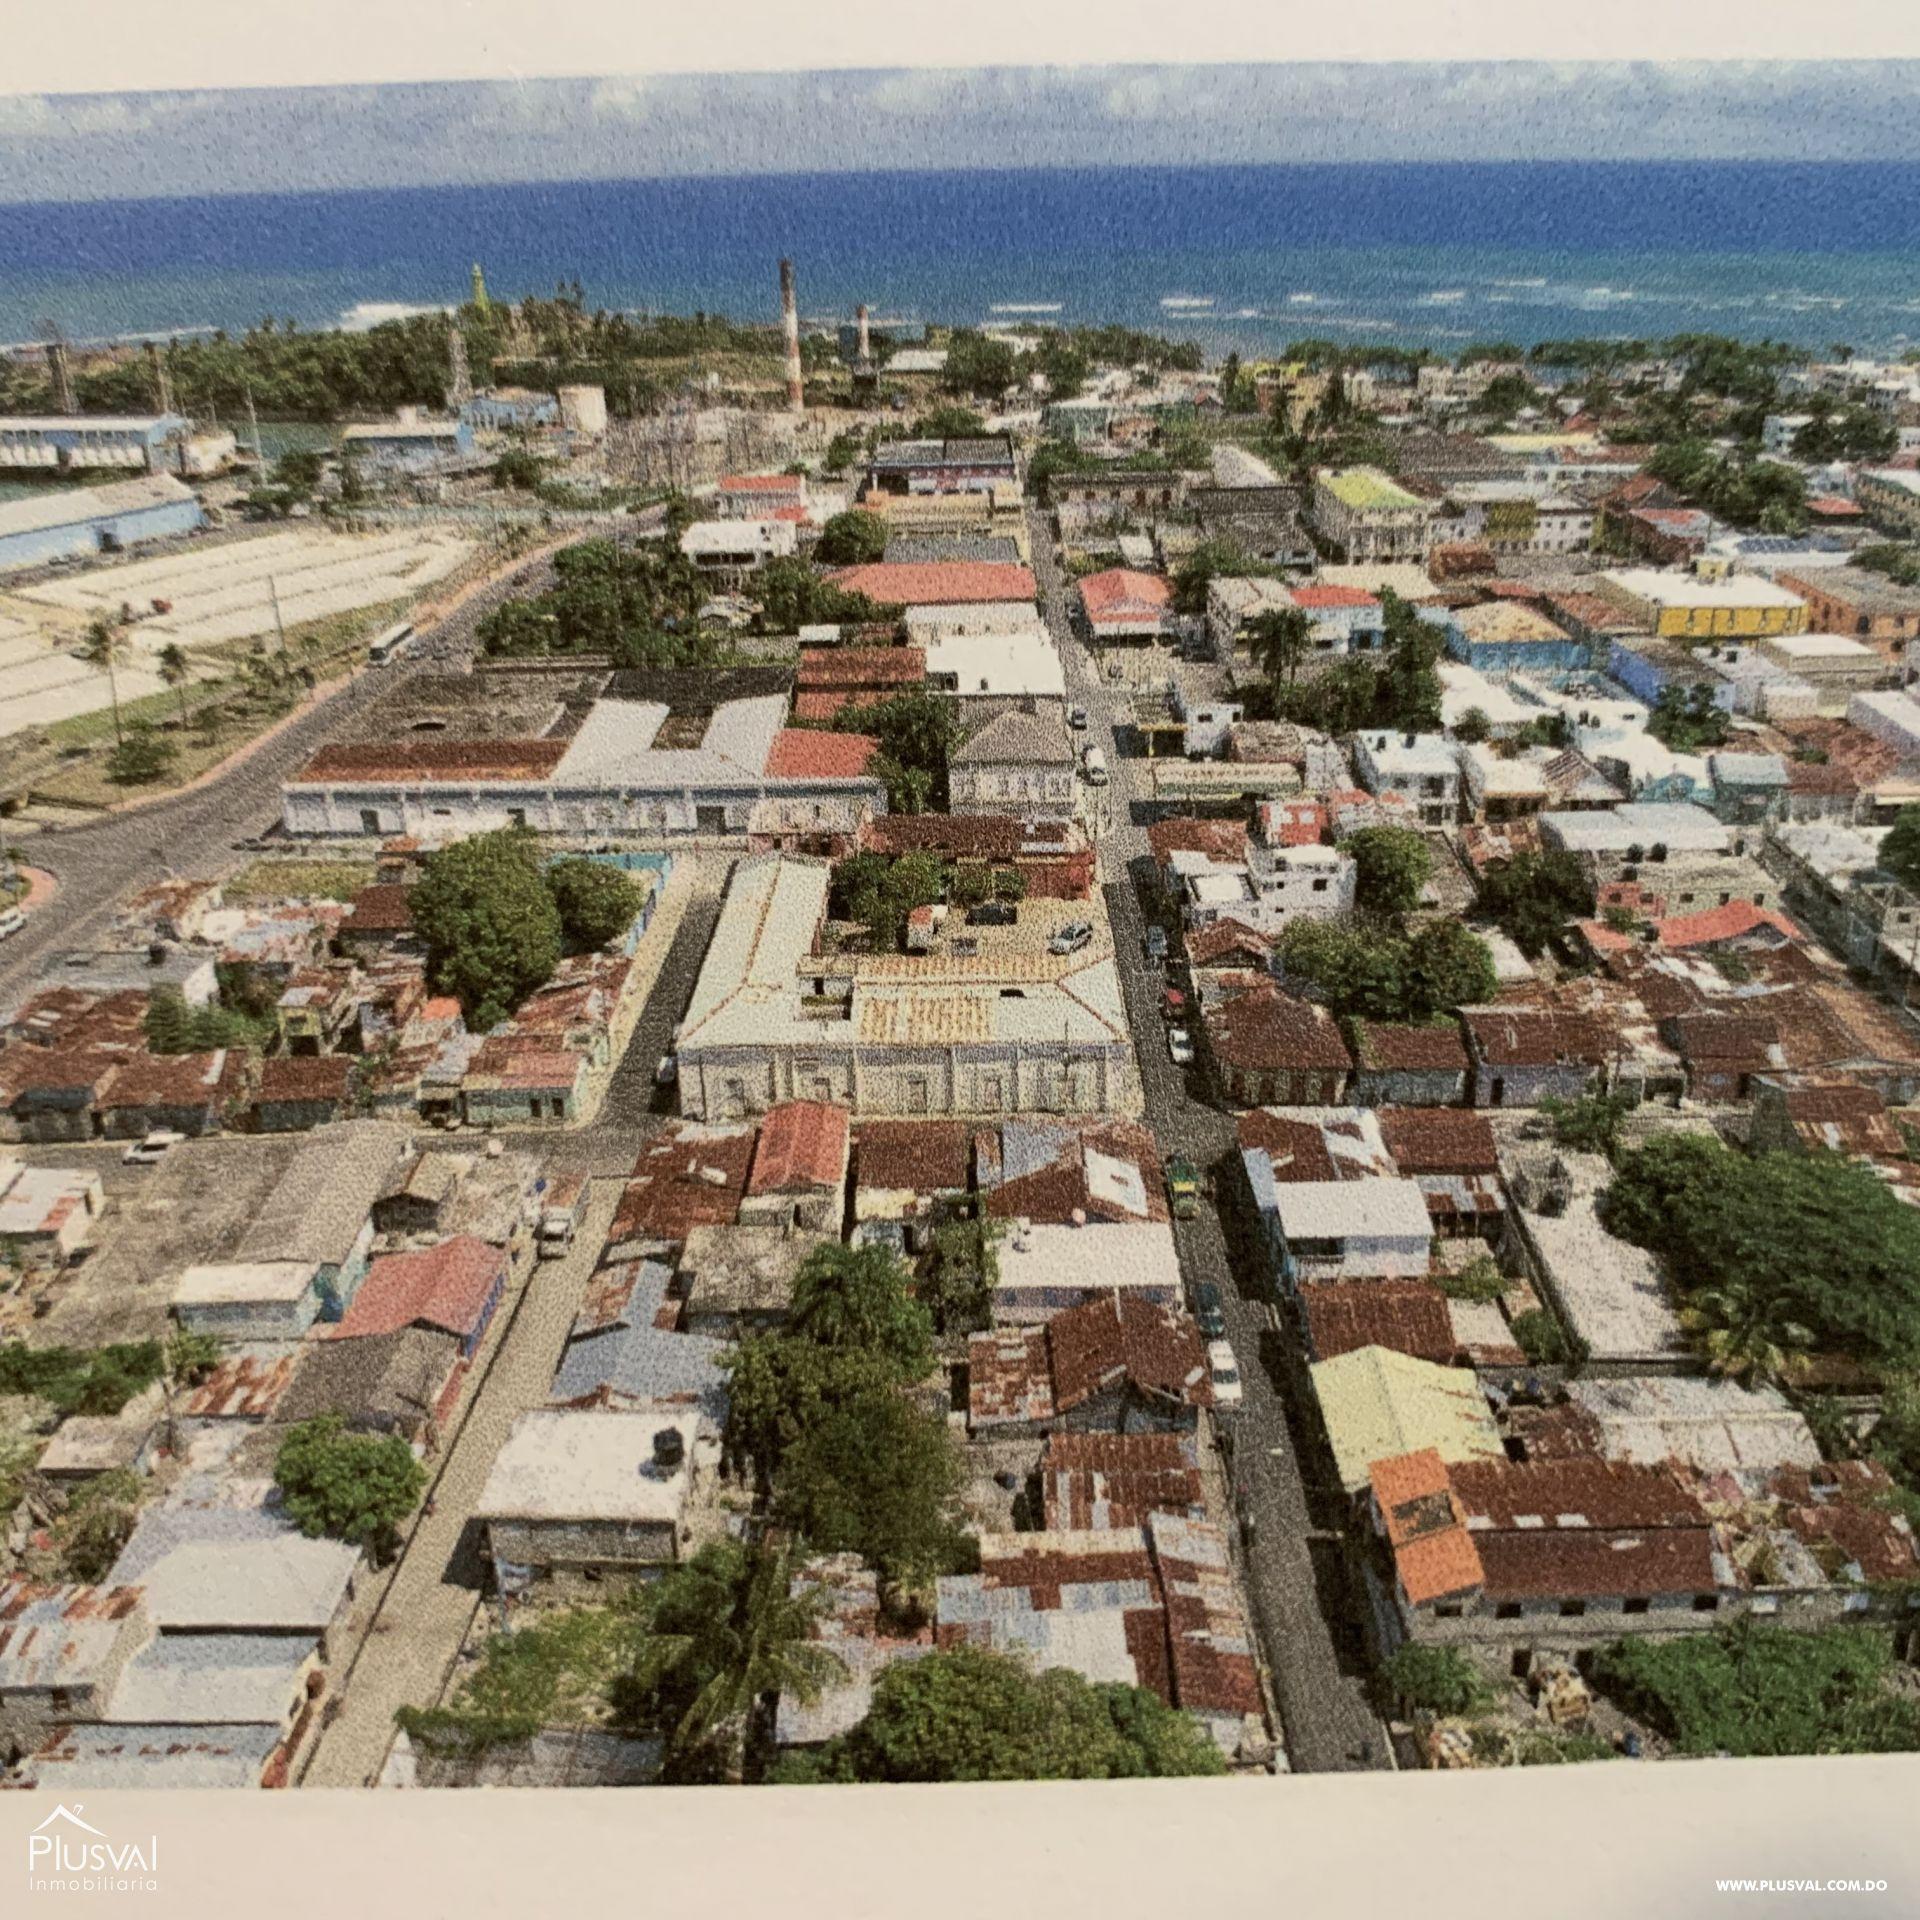 Nave o Solar en venta, Puerto Plata 164942